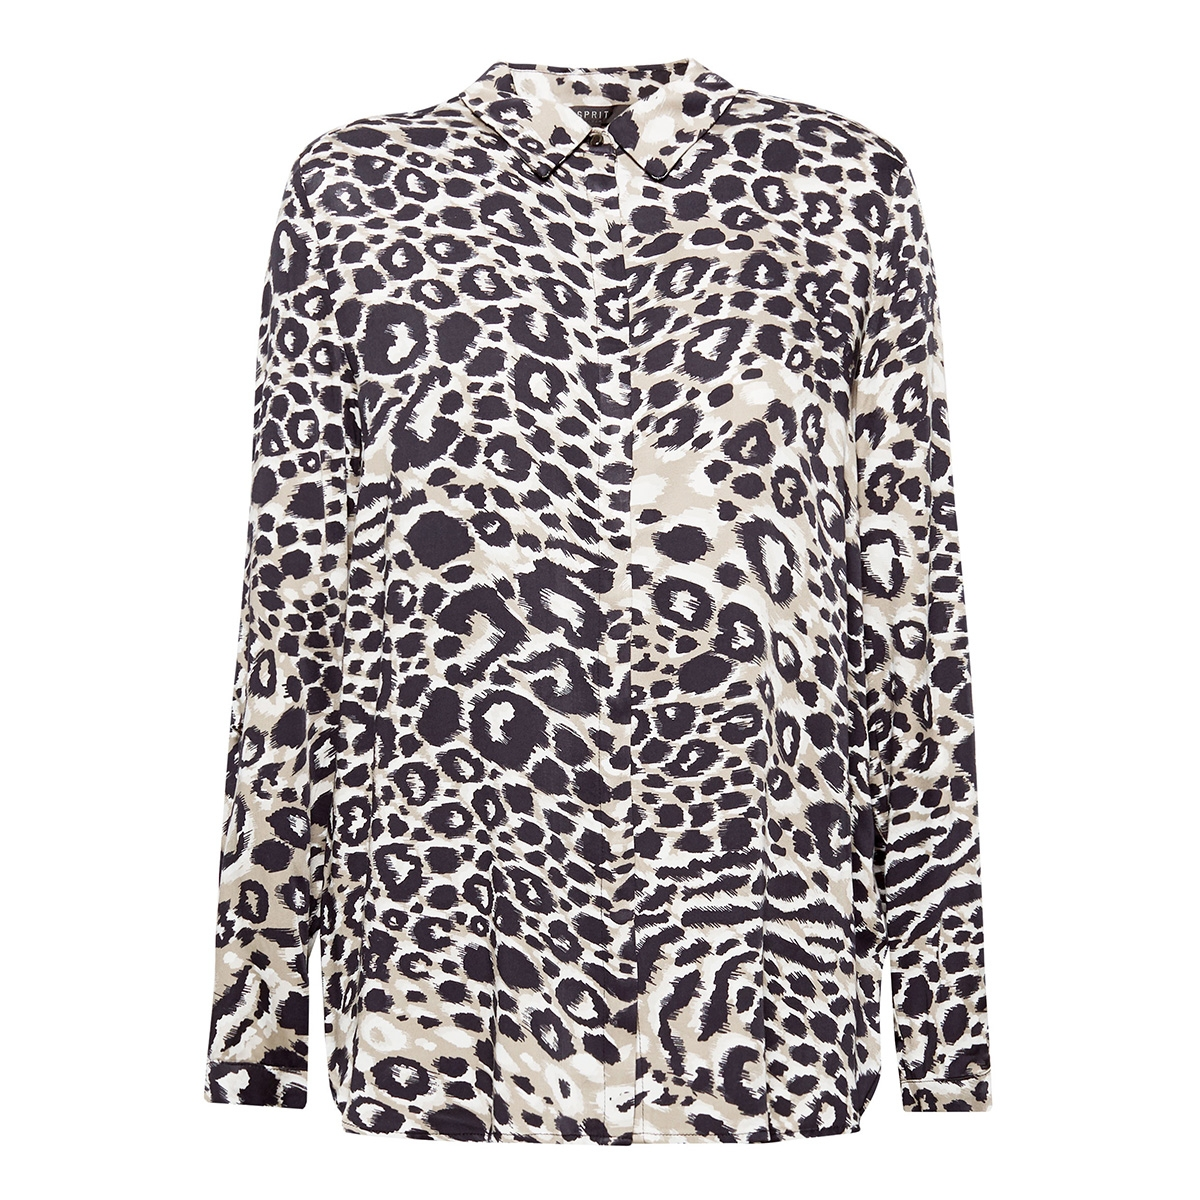 overhemdblouse met luipaardprint 089eo1f009 esprit blouse e240